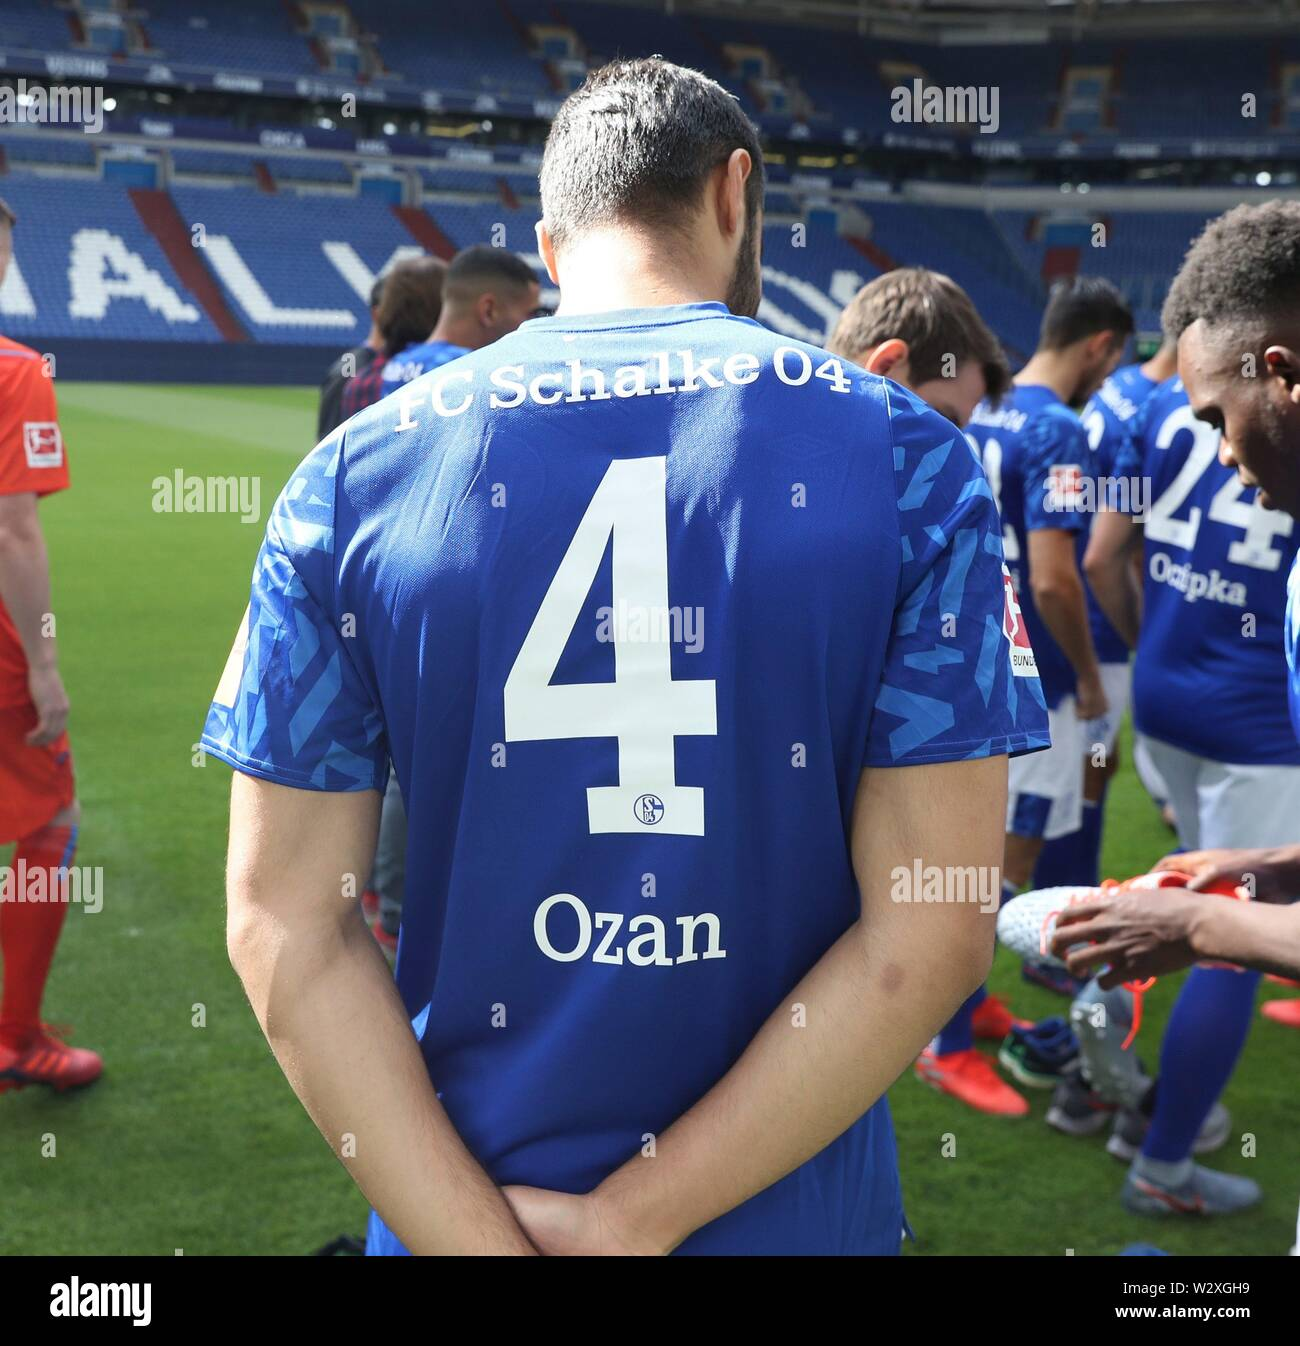 firo: 10.07.2019 football, 2019/2020 FC Schalke 04, jersey, Ruckennumemr 4, four, Ozan Kabak, back view   usage worldwide - Stock Image